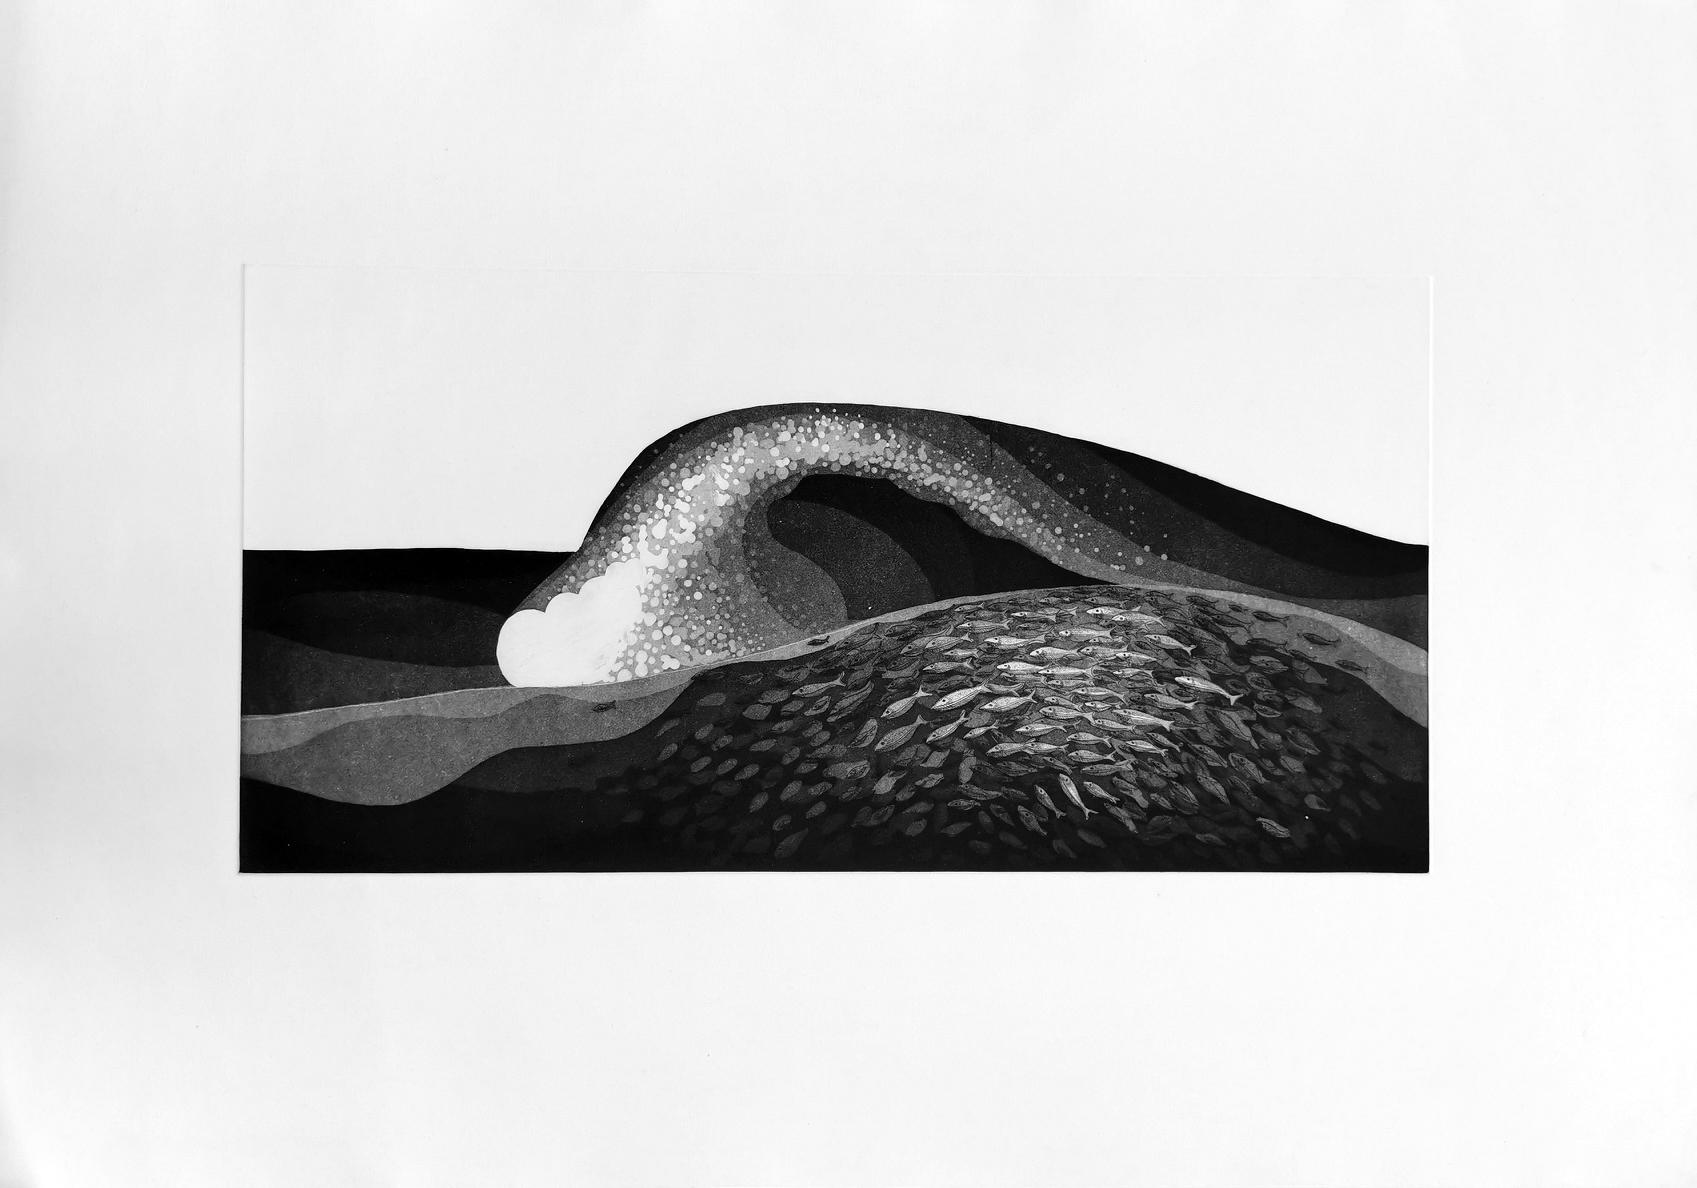 wave (fish) - 70 x 50